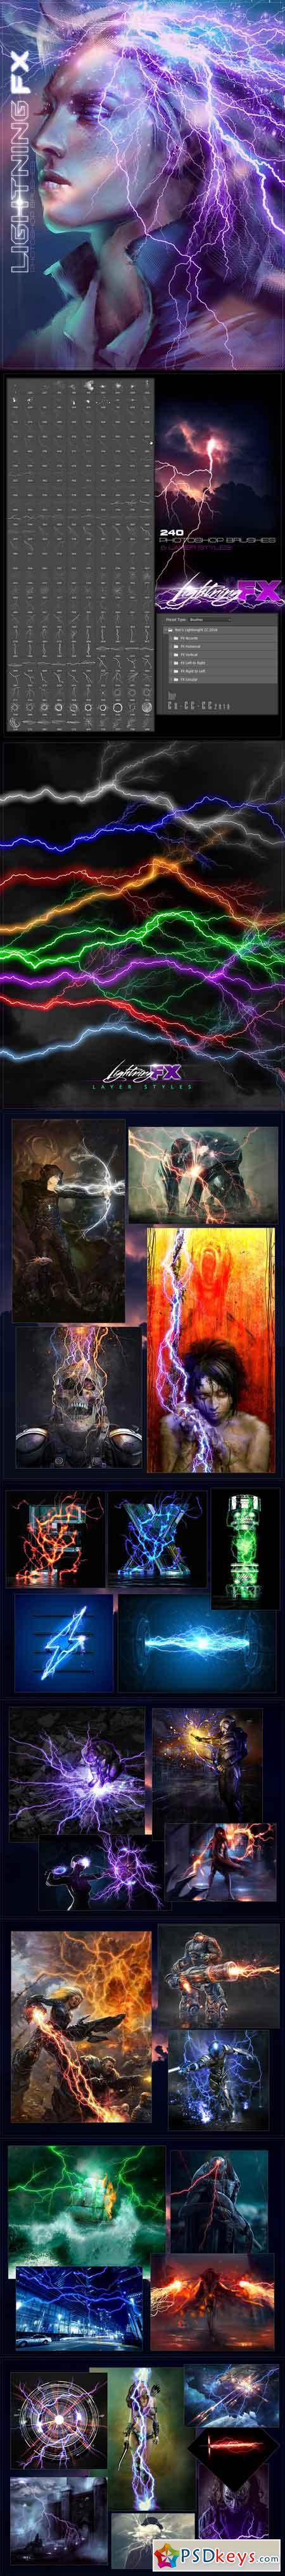 Rons Lightning FX